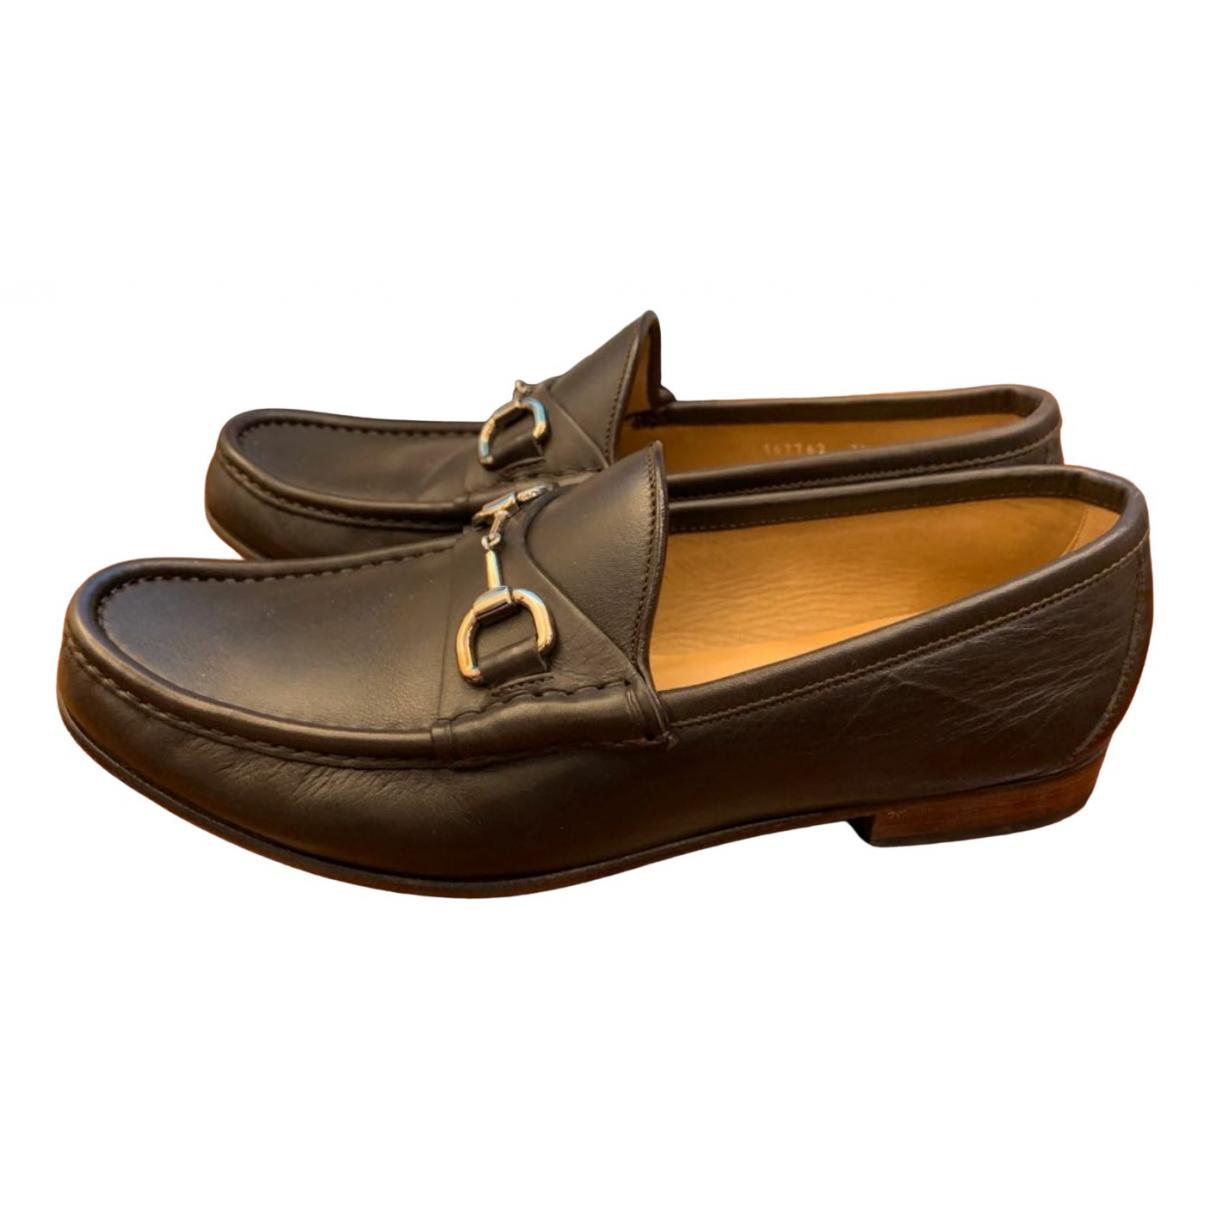 Gucci Jordaan Brown Leather Flats for Men 7.5 UK